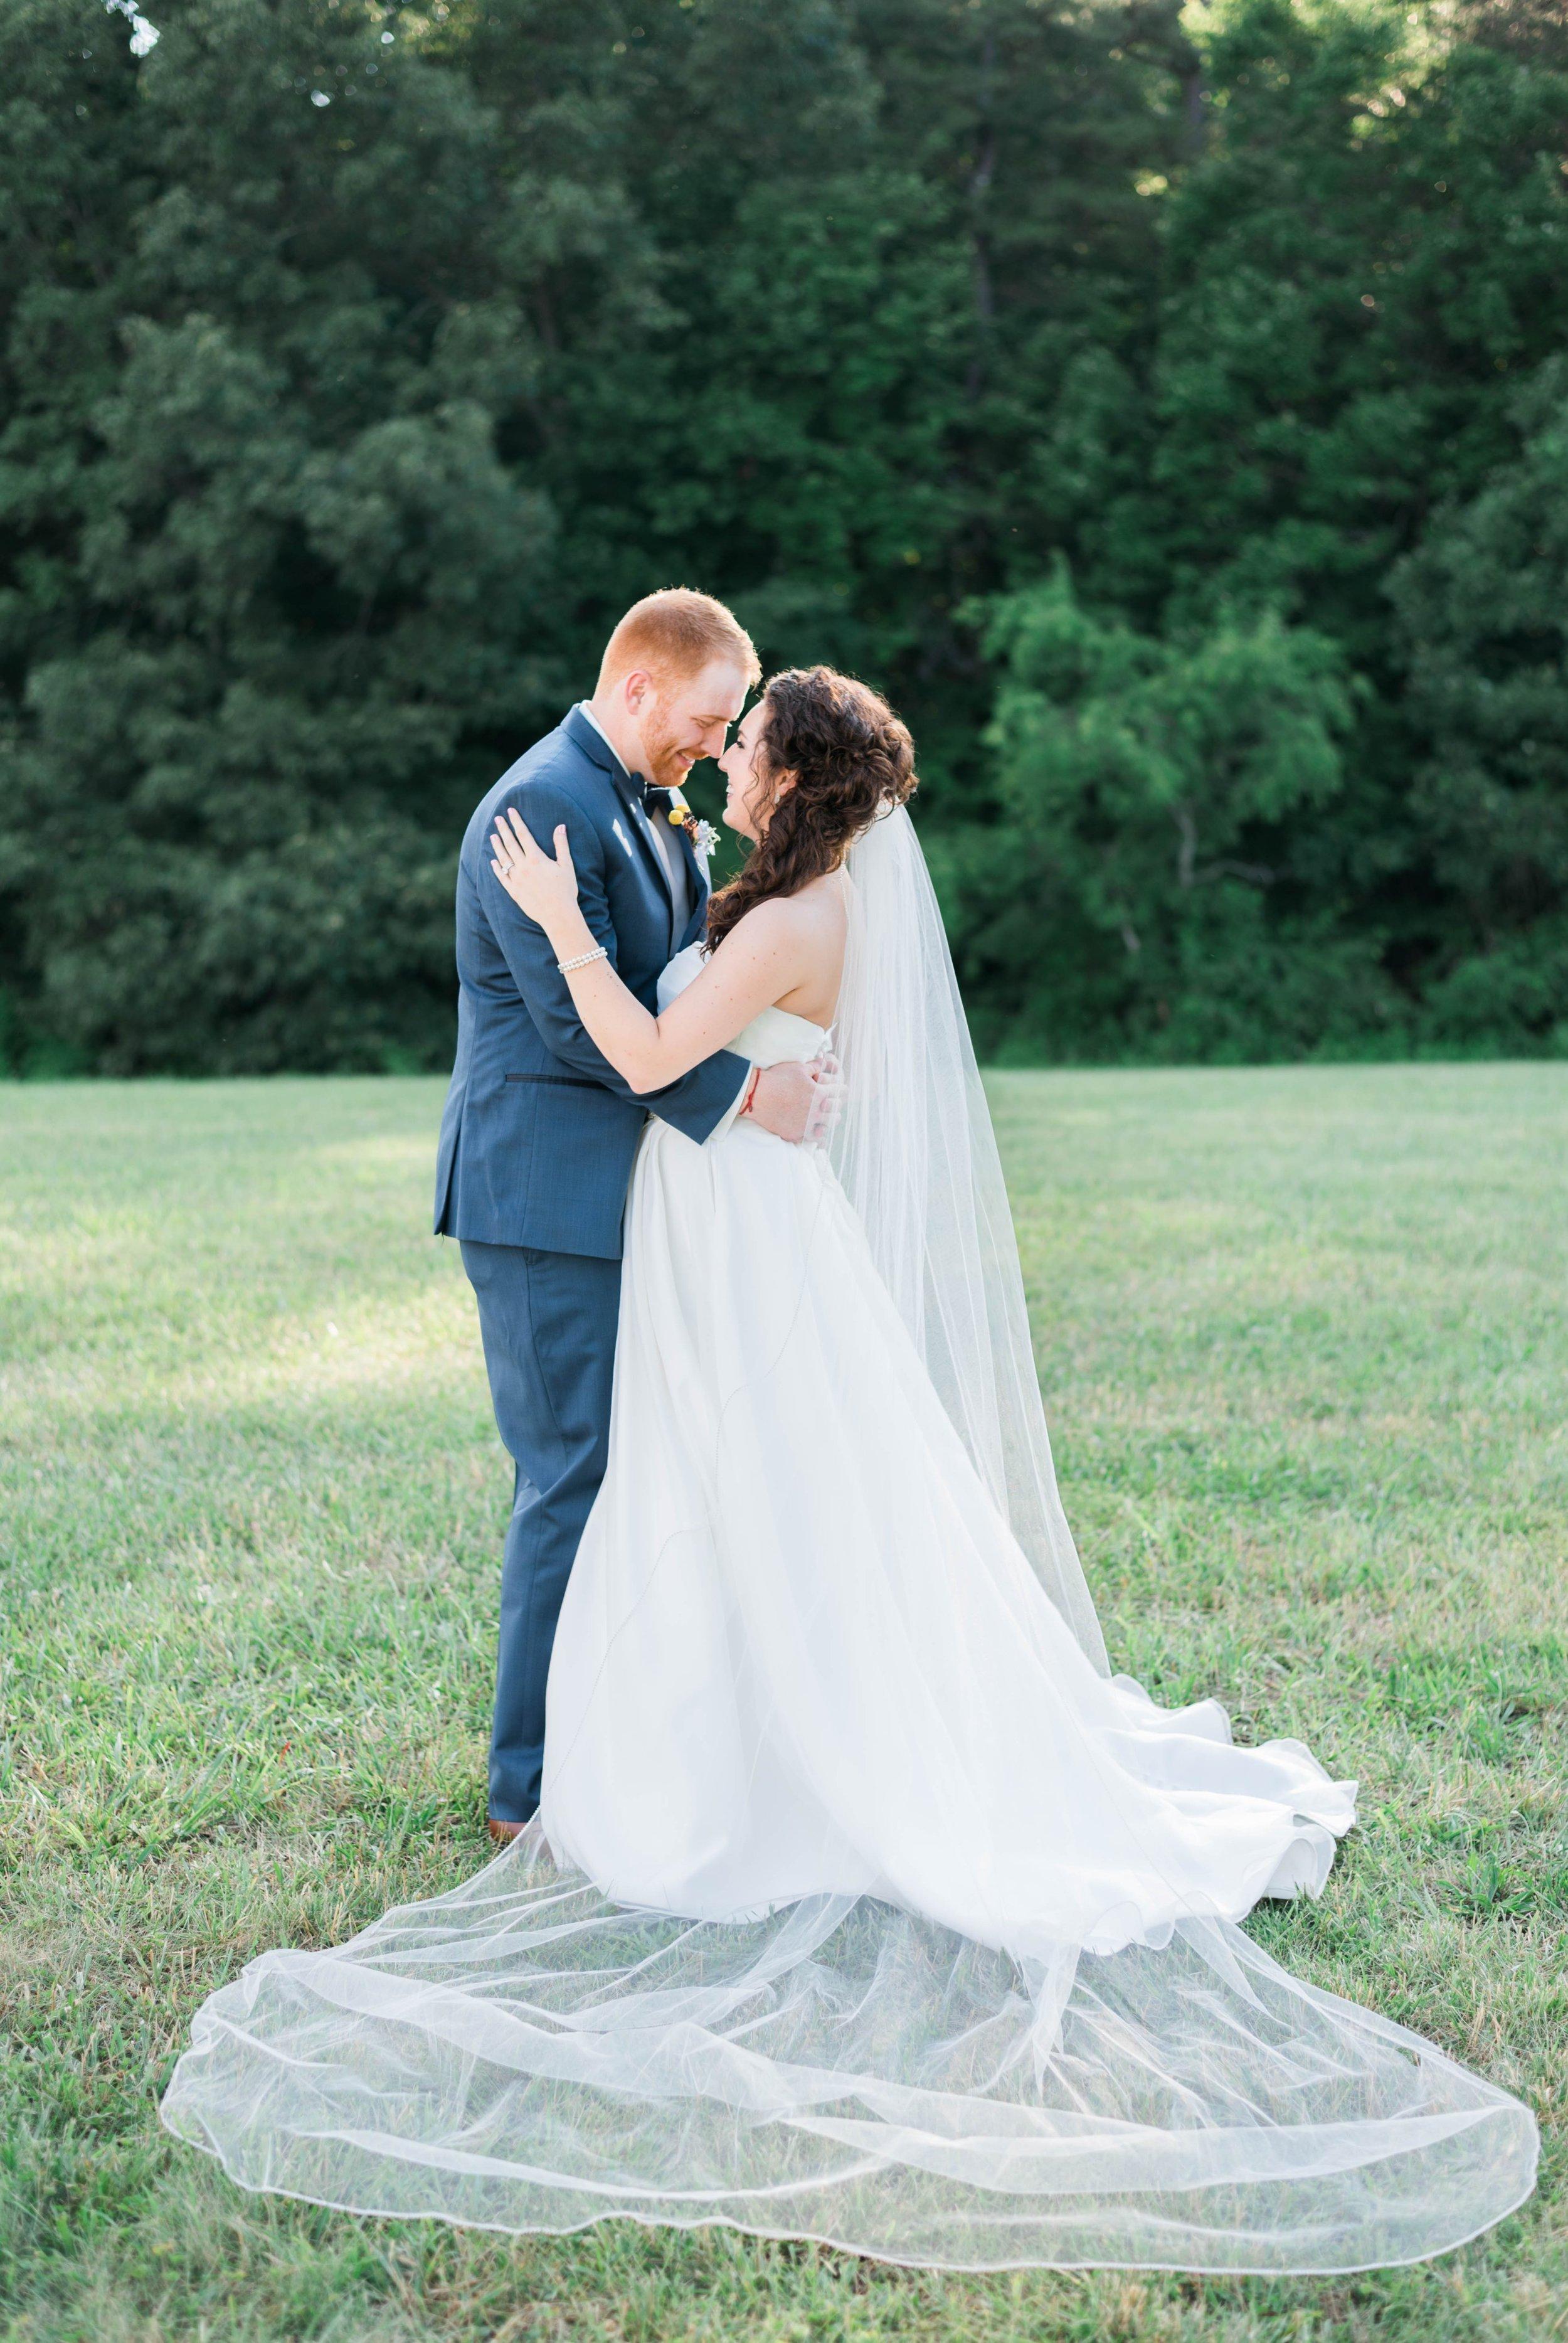 SorellaFarms_EvingtonVA_Lynchburgweddingphotographer_VirginiaweddingPhotographer_AshleyAndrewSorellaFarmsWedding 14.jpg